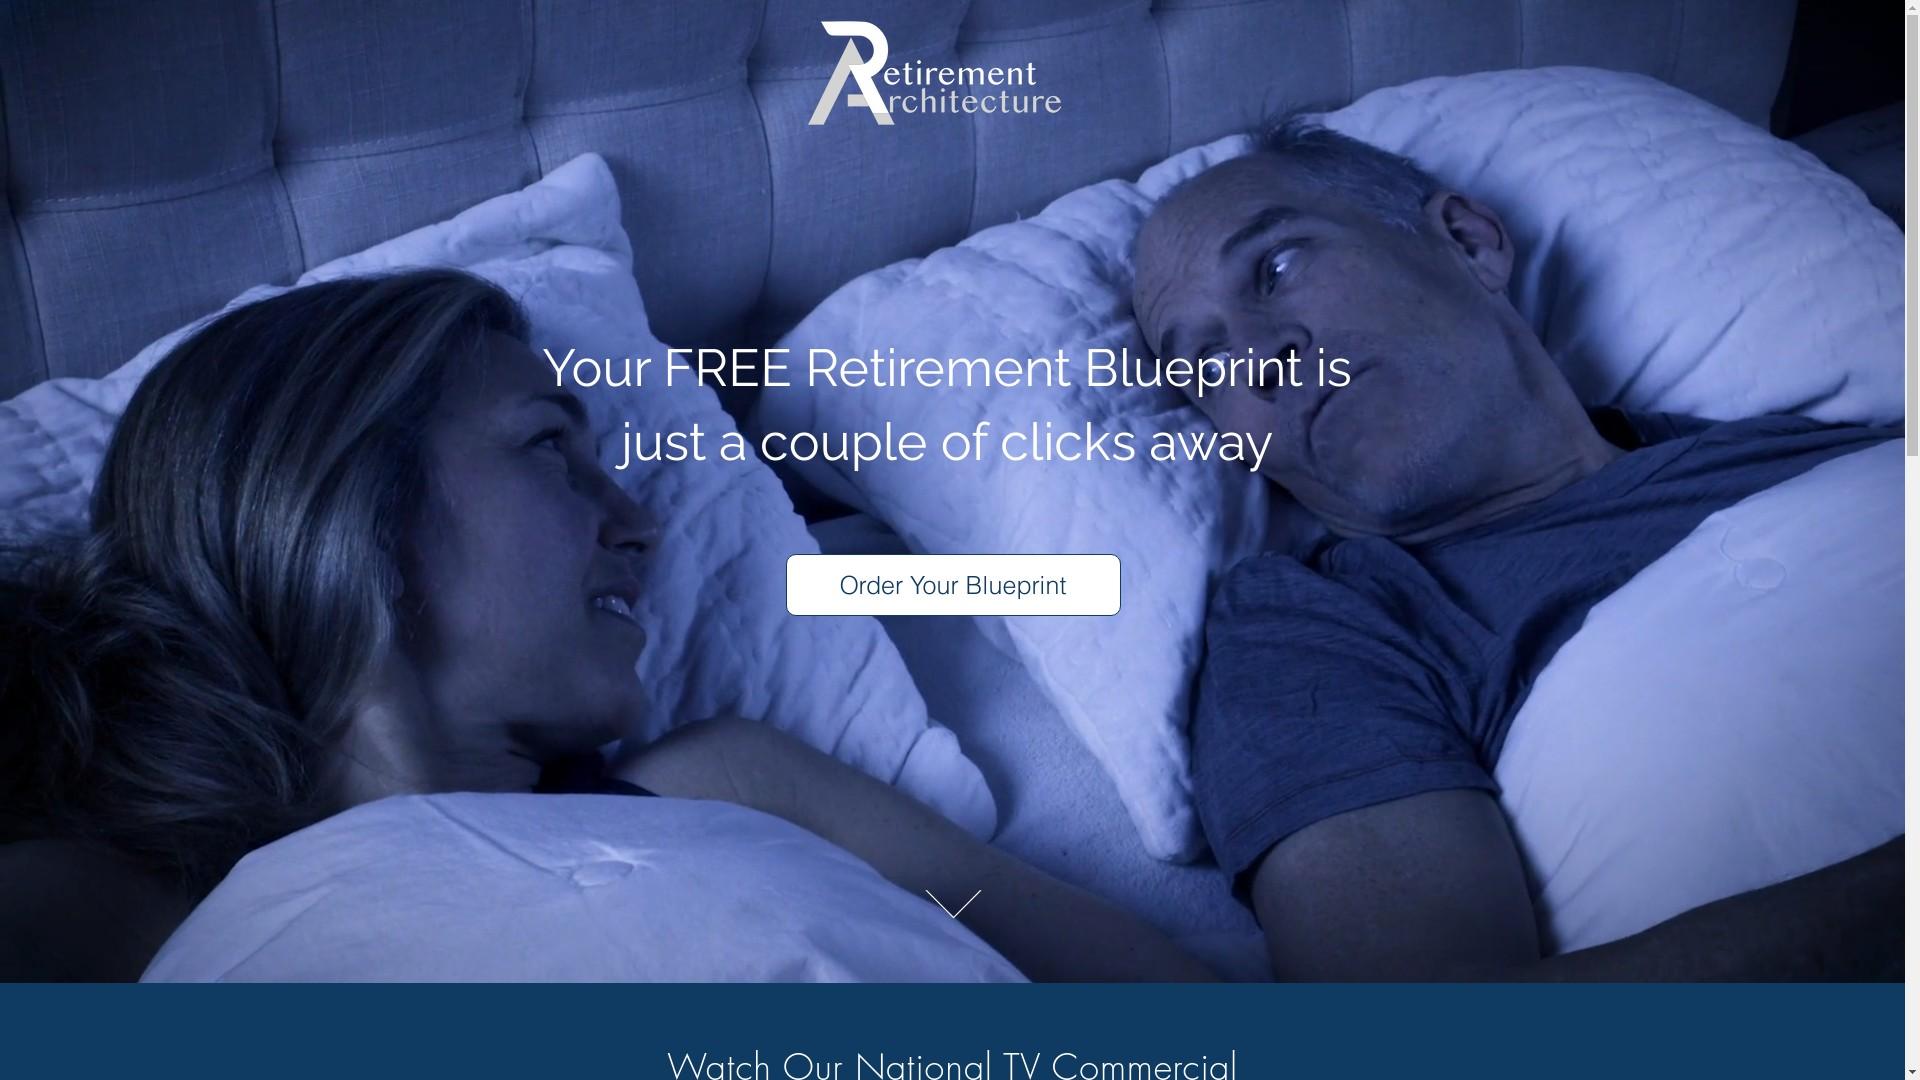 Is getfreeblueprint a Scam? Free Retirement Blueprint